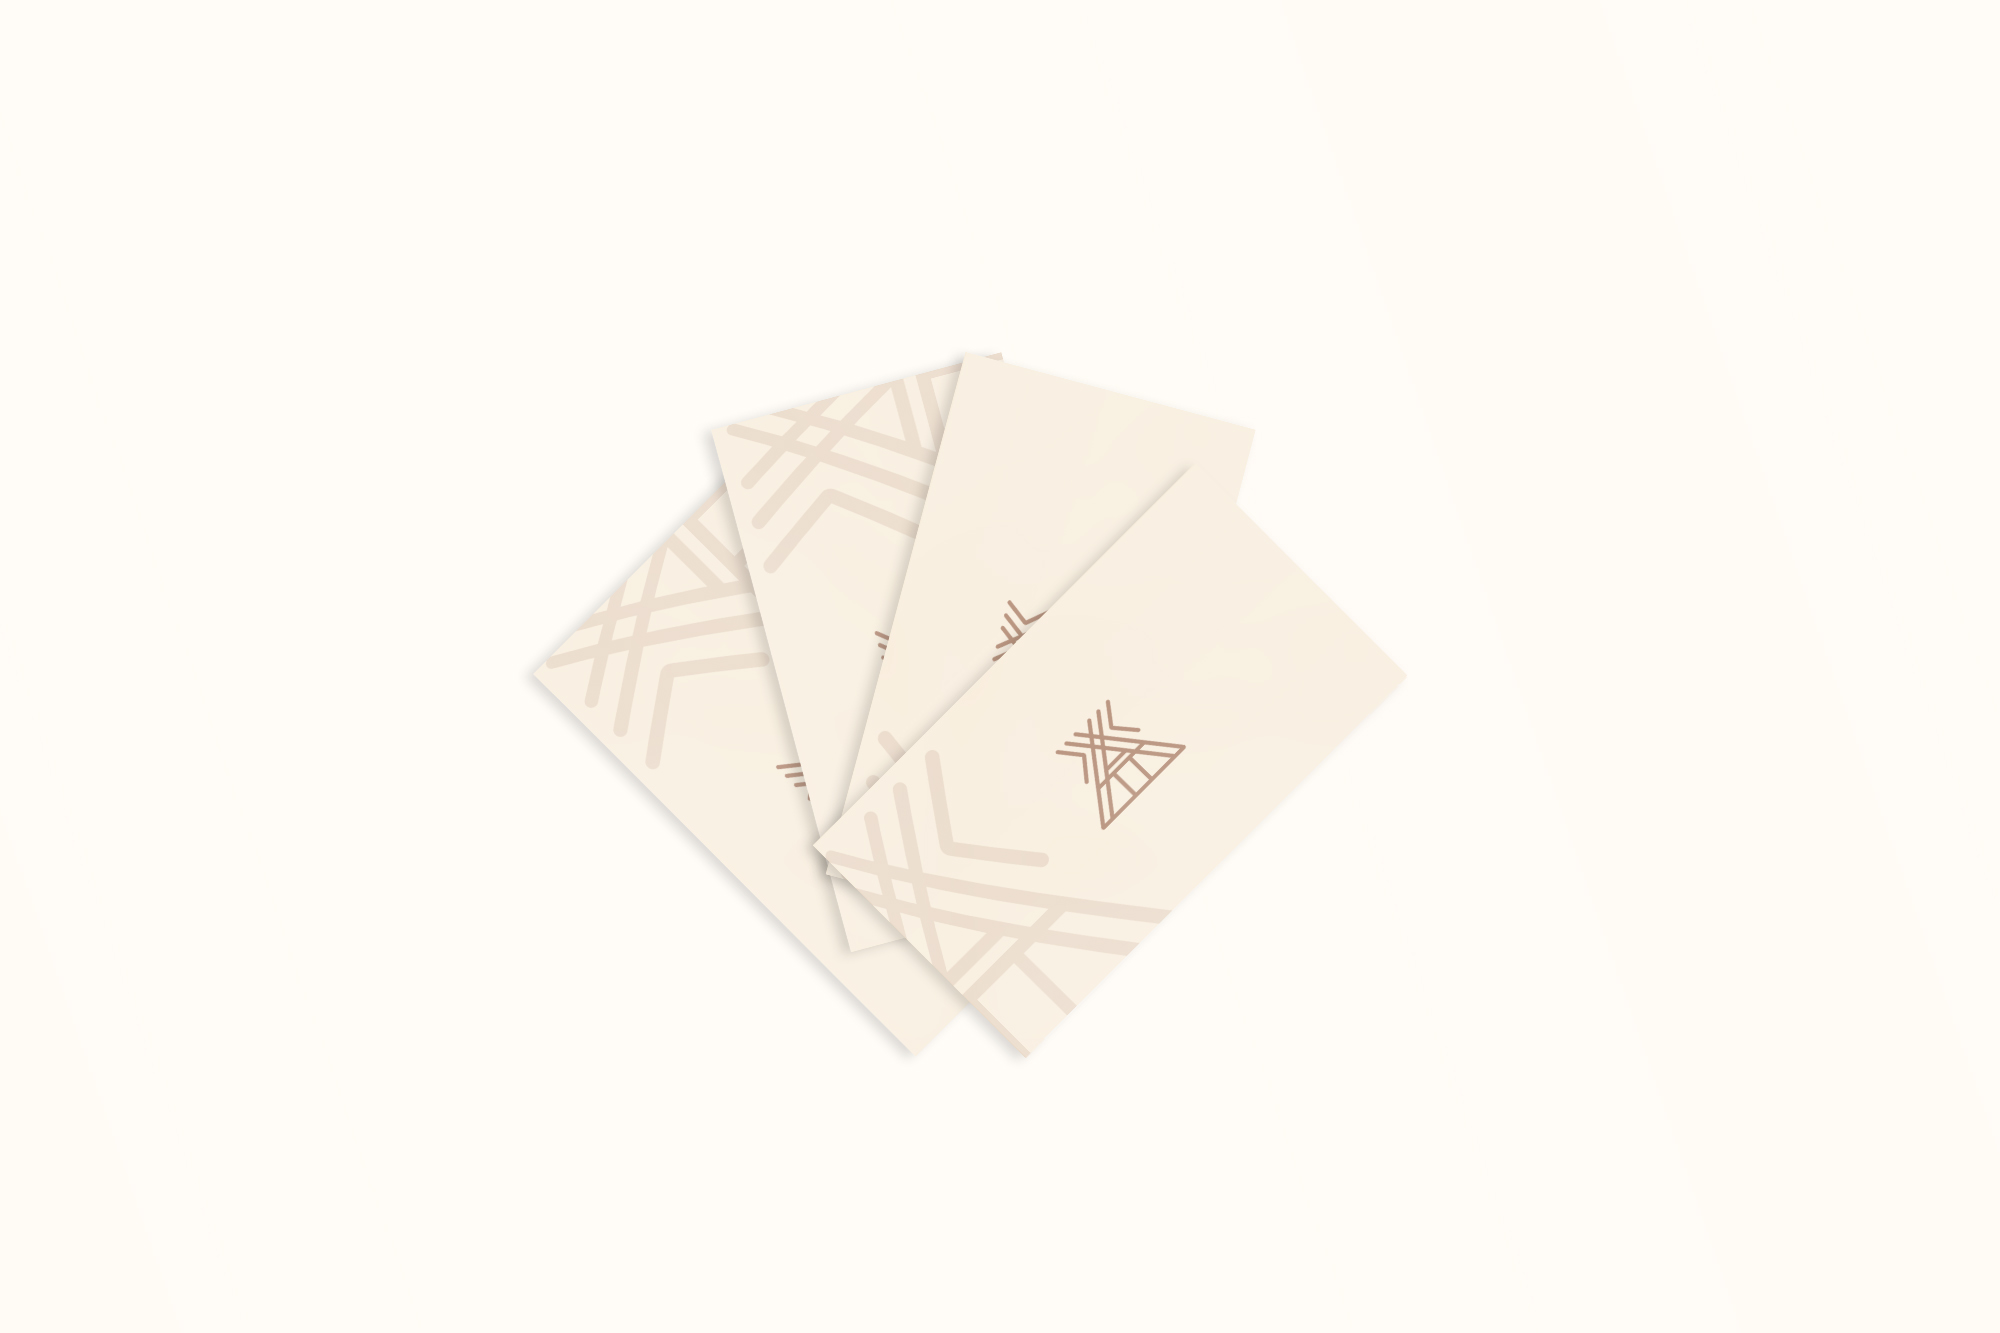 Inzho Business Cards Mockup.jpg